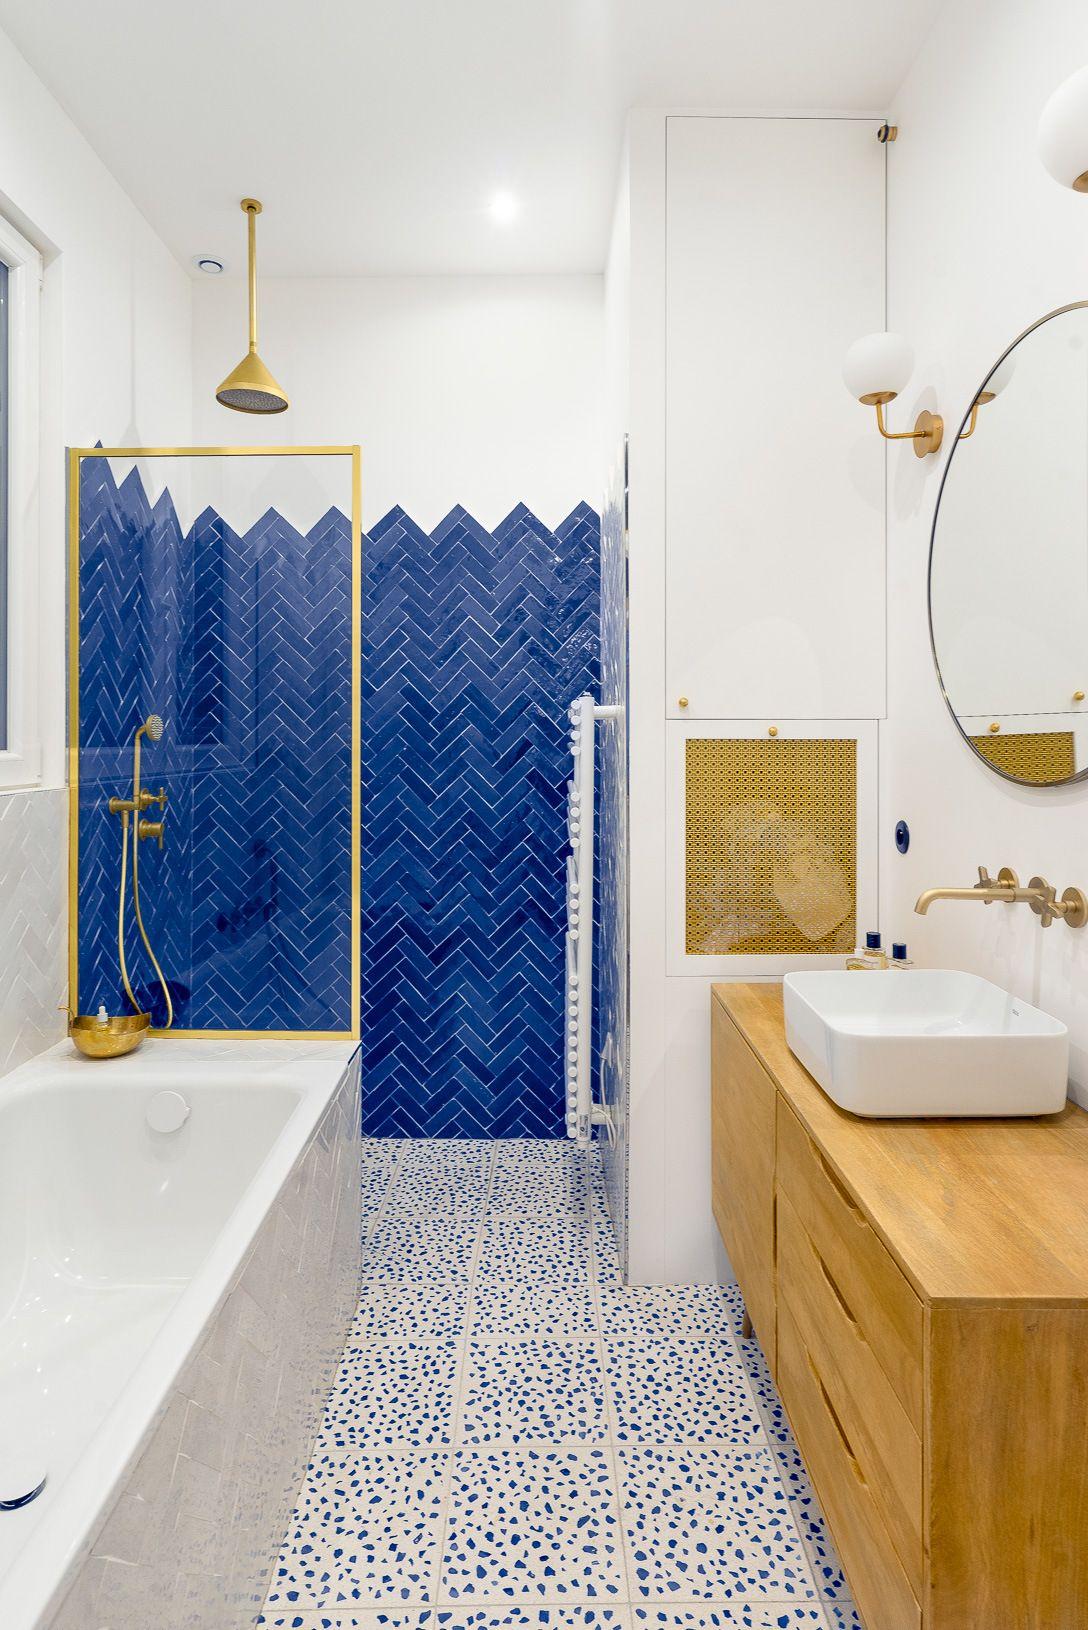 Salle de bain colorée avec meuble de salle de bain en bois ...